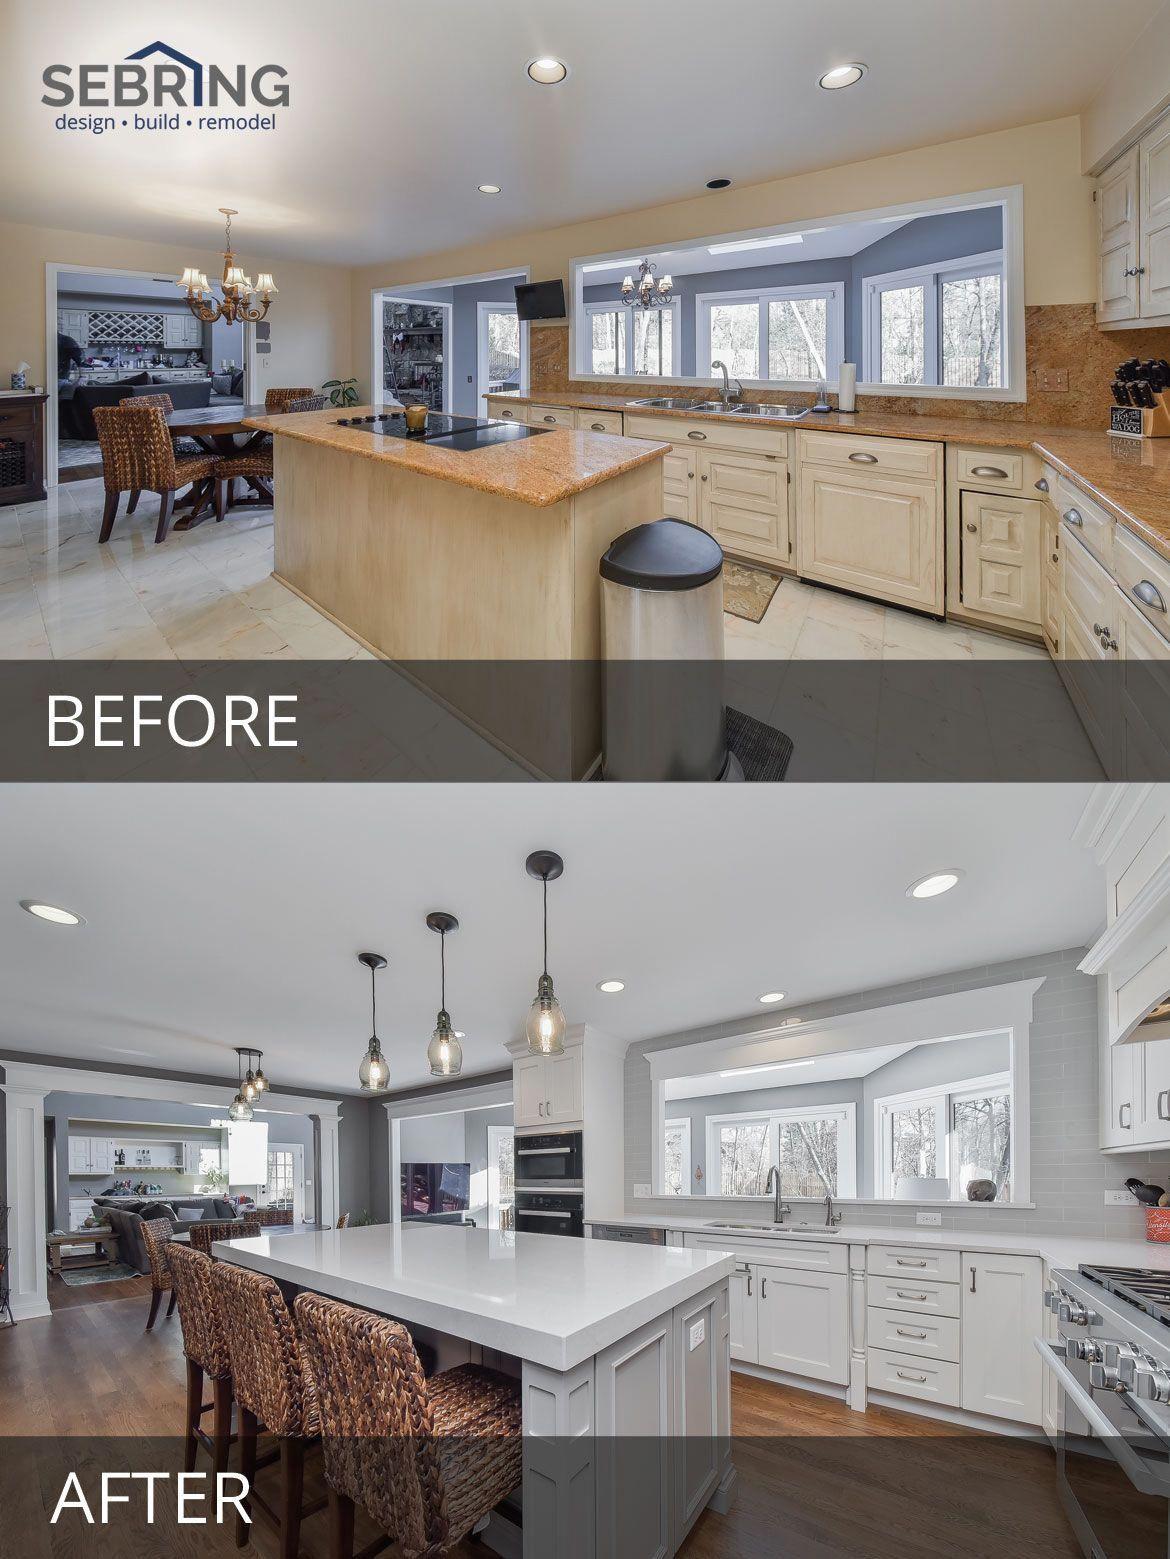 Kitchen Design Naperville Mats Walmart Remodeling Before And After Pictures Sebring Build